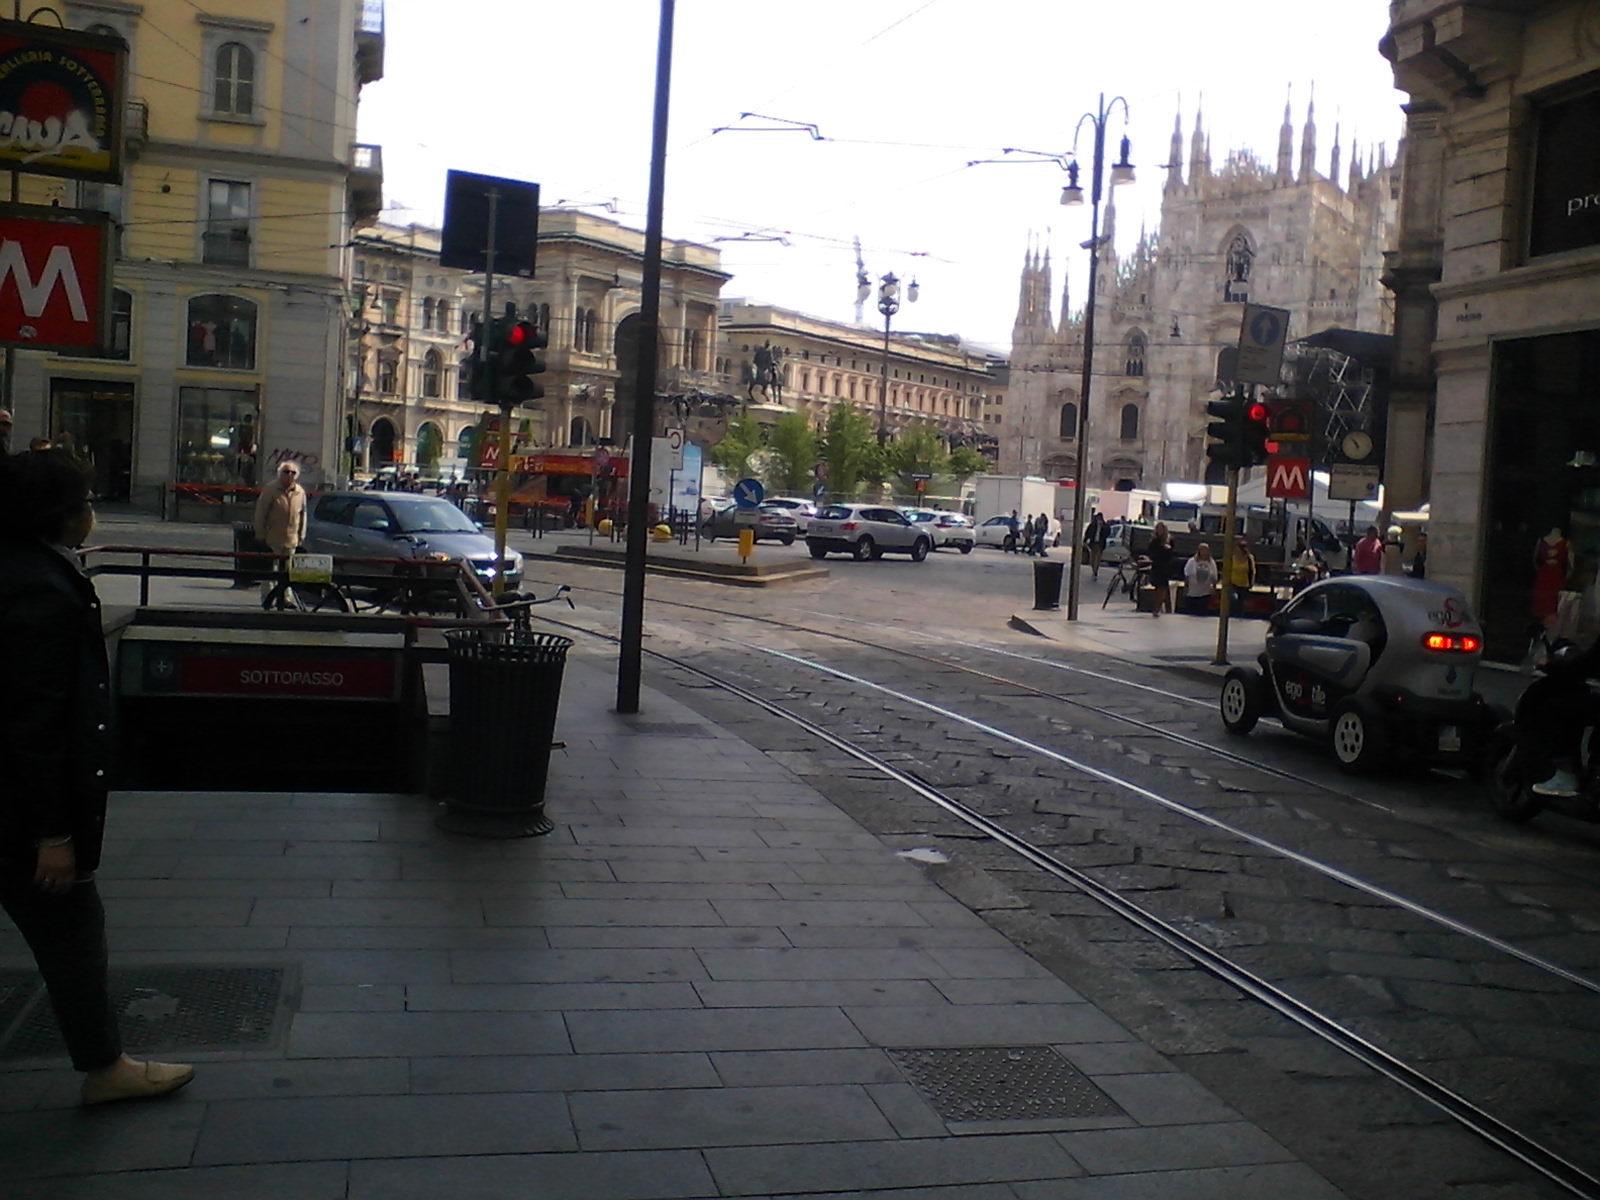 Piazza Duomo, via Torino, Milano - Apartment